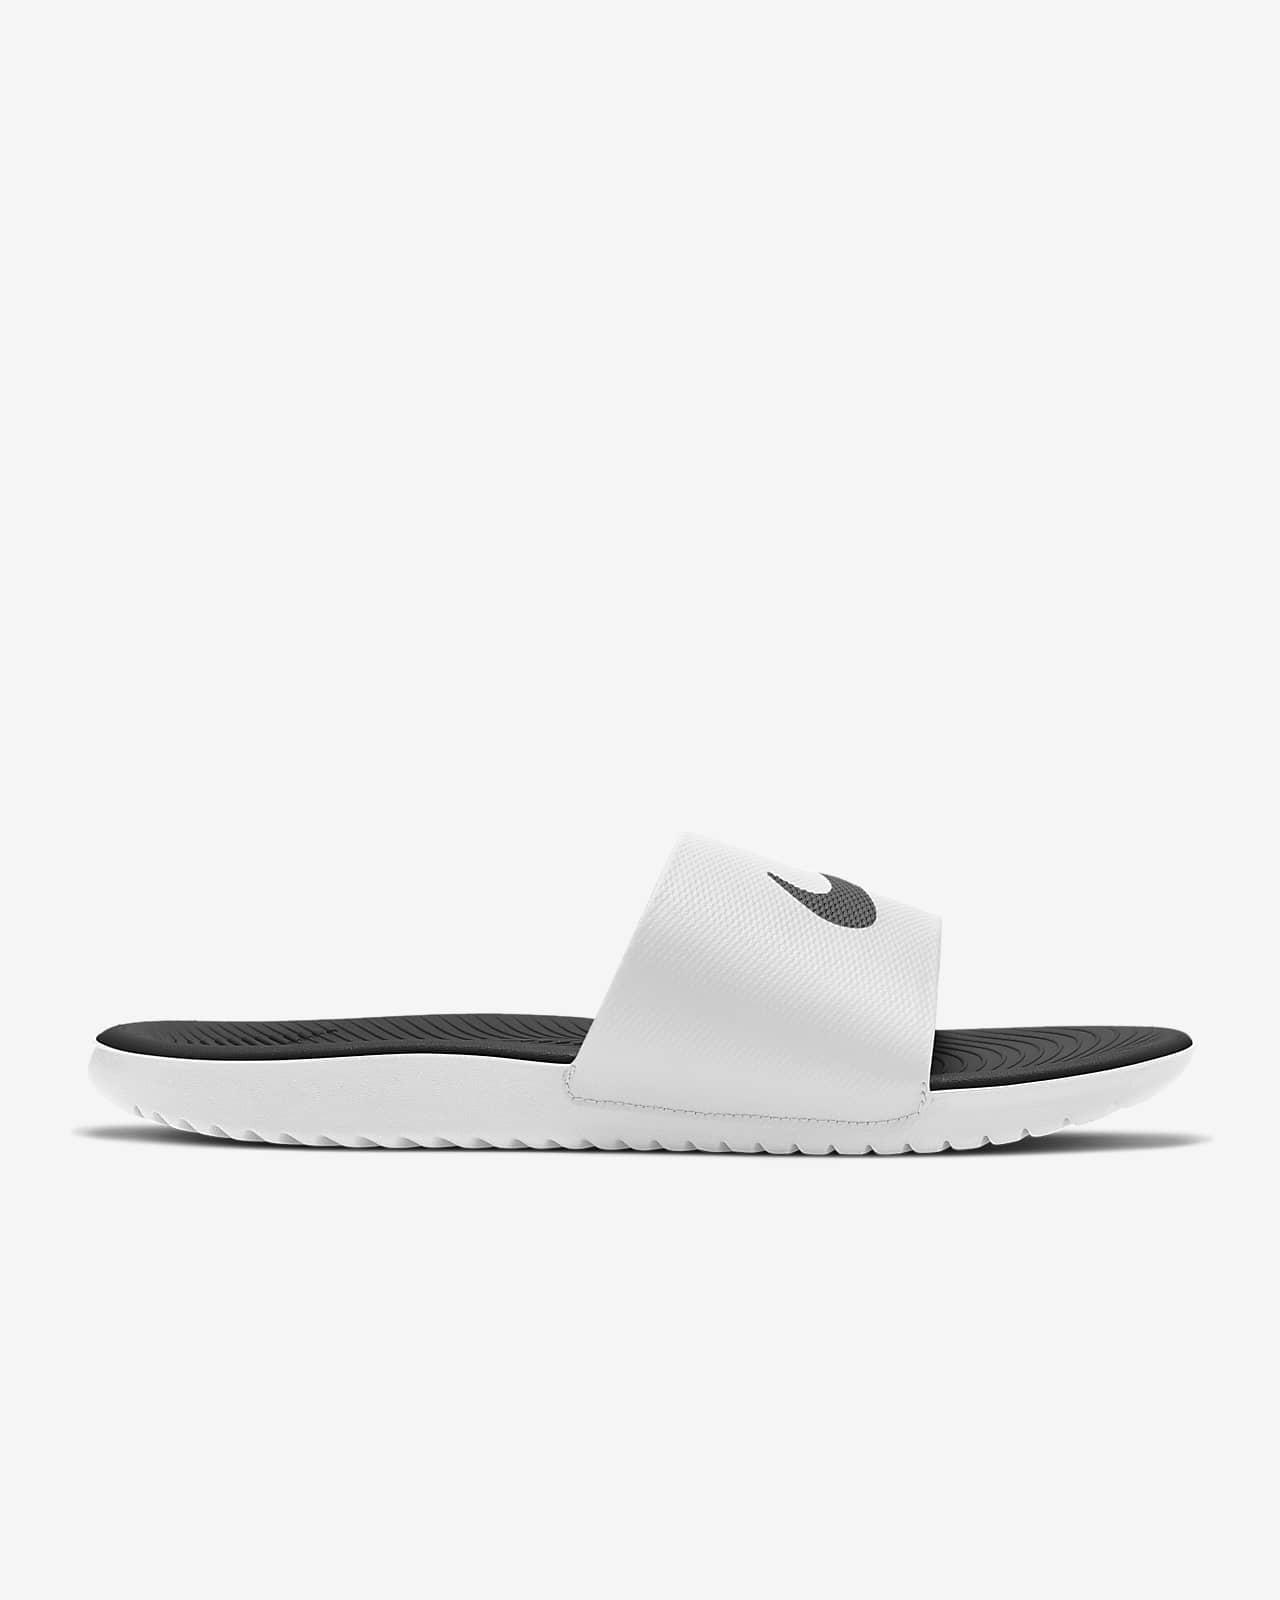 Nike Kawa Men's Slide. Nike SG